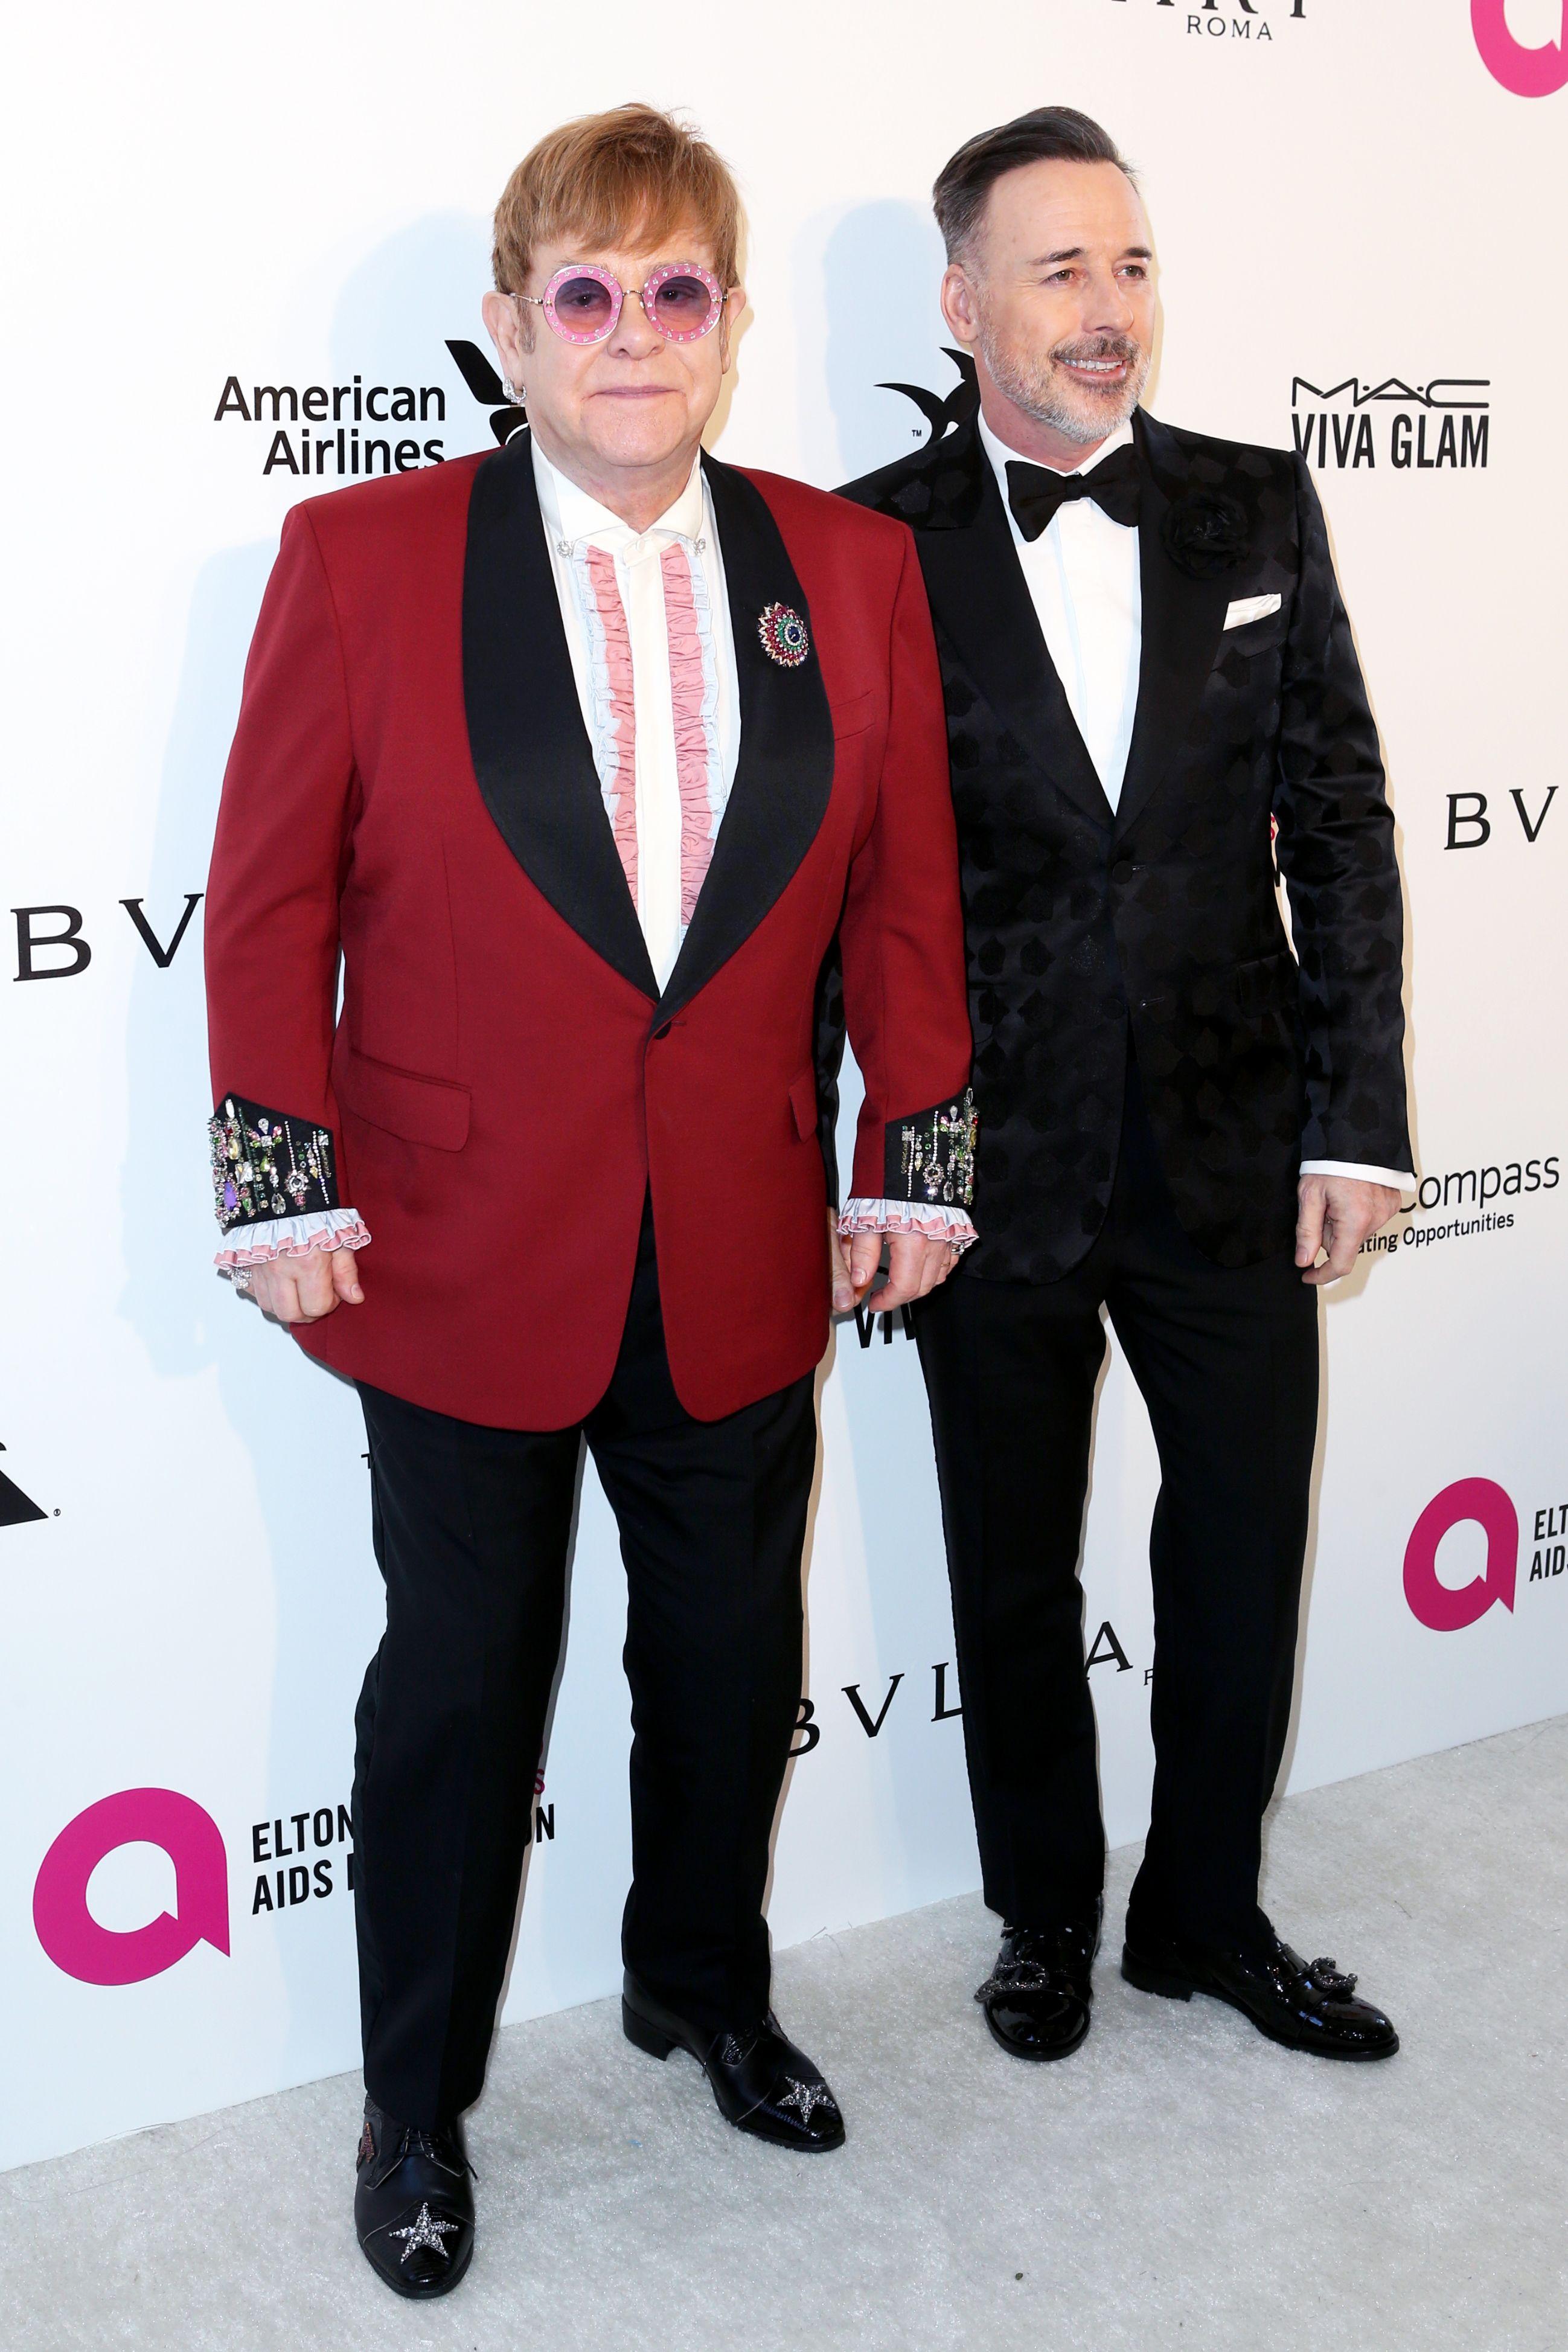 Sir Elton John and David Furnish Elton John AIDS Foundation Academy Awards Viewing Party, Arrivals, Los Angeles, USA - 04 Mar 2018